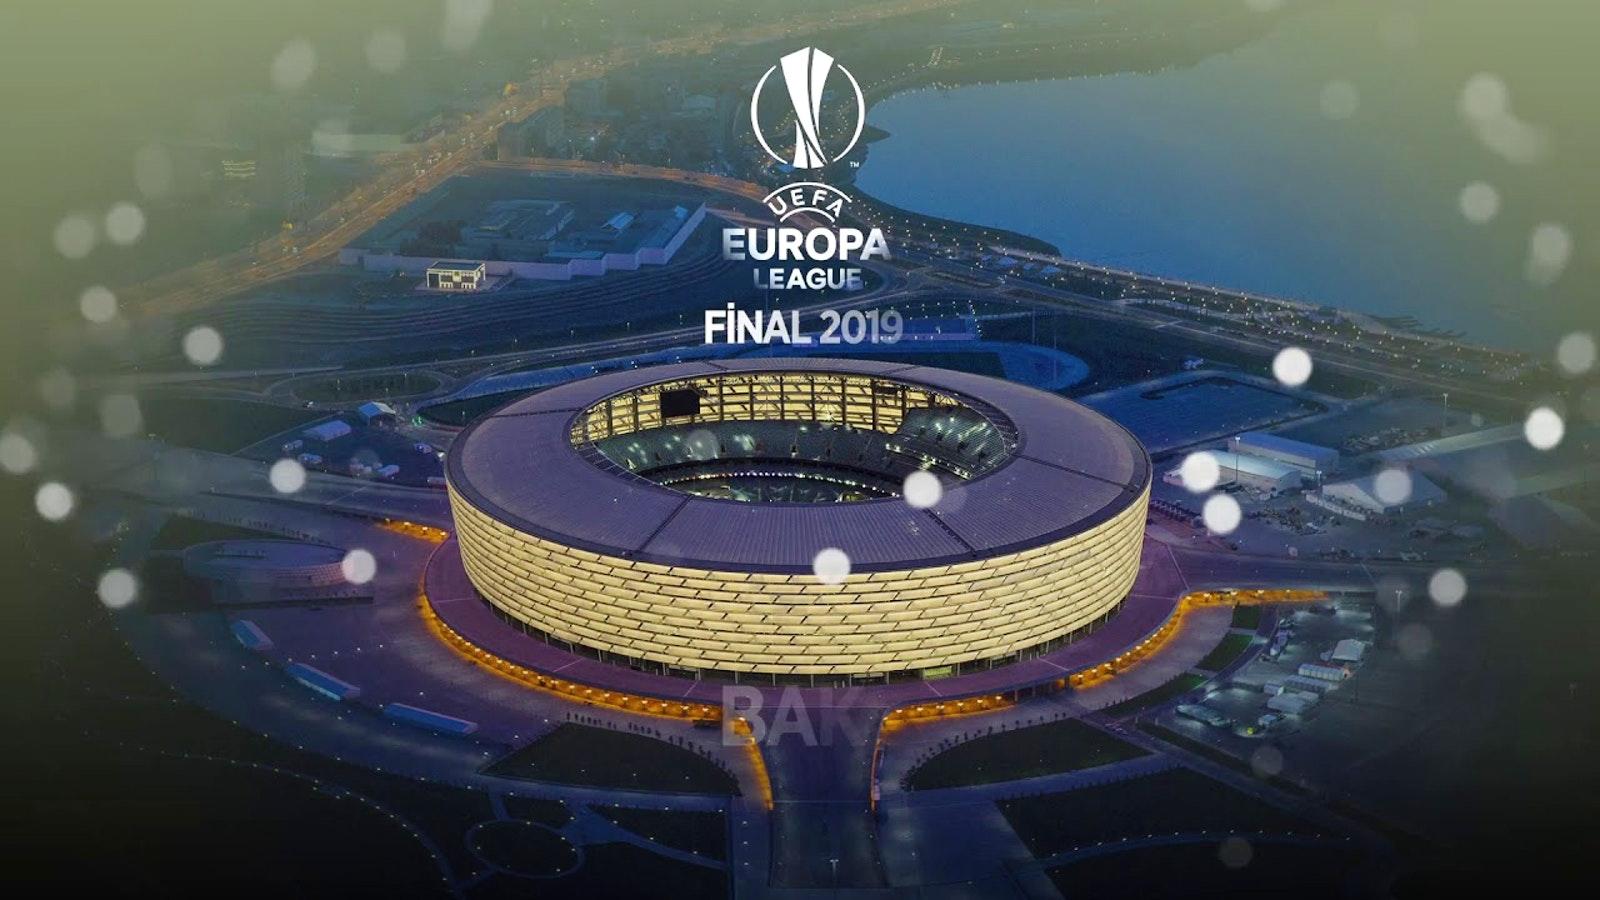 Europa League 2019 Wallpapers 1600x900